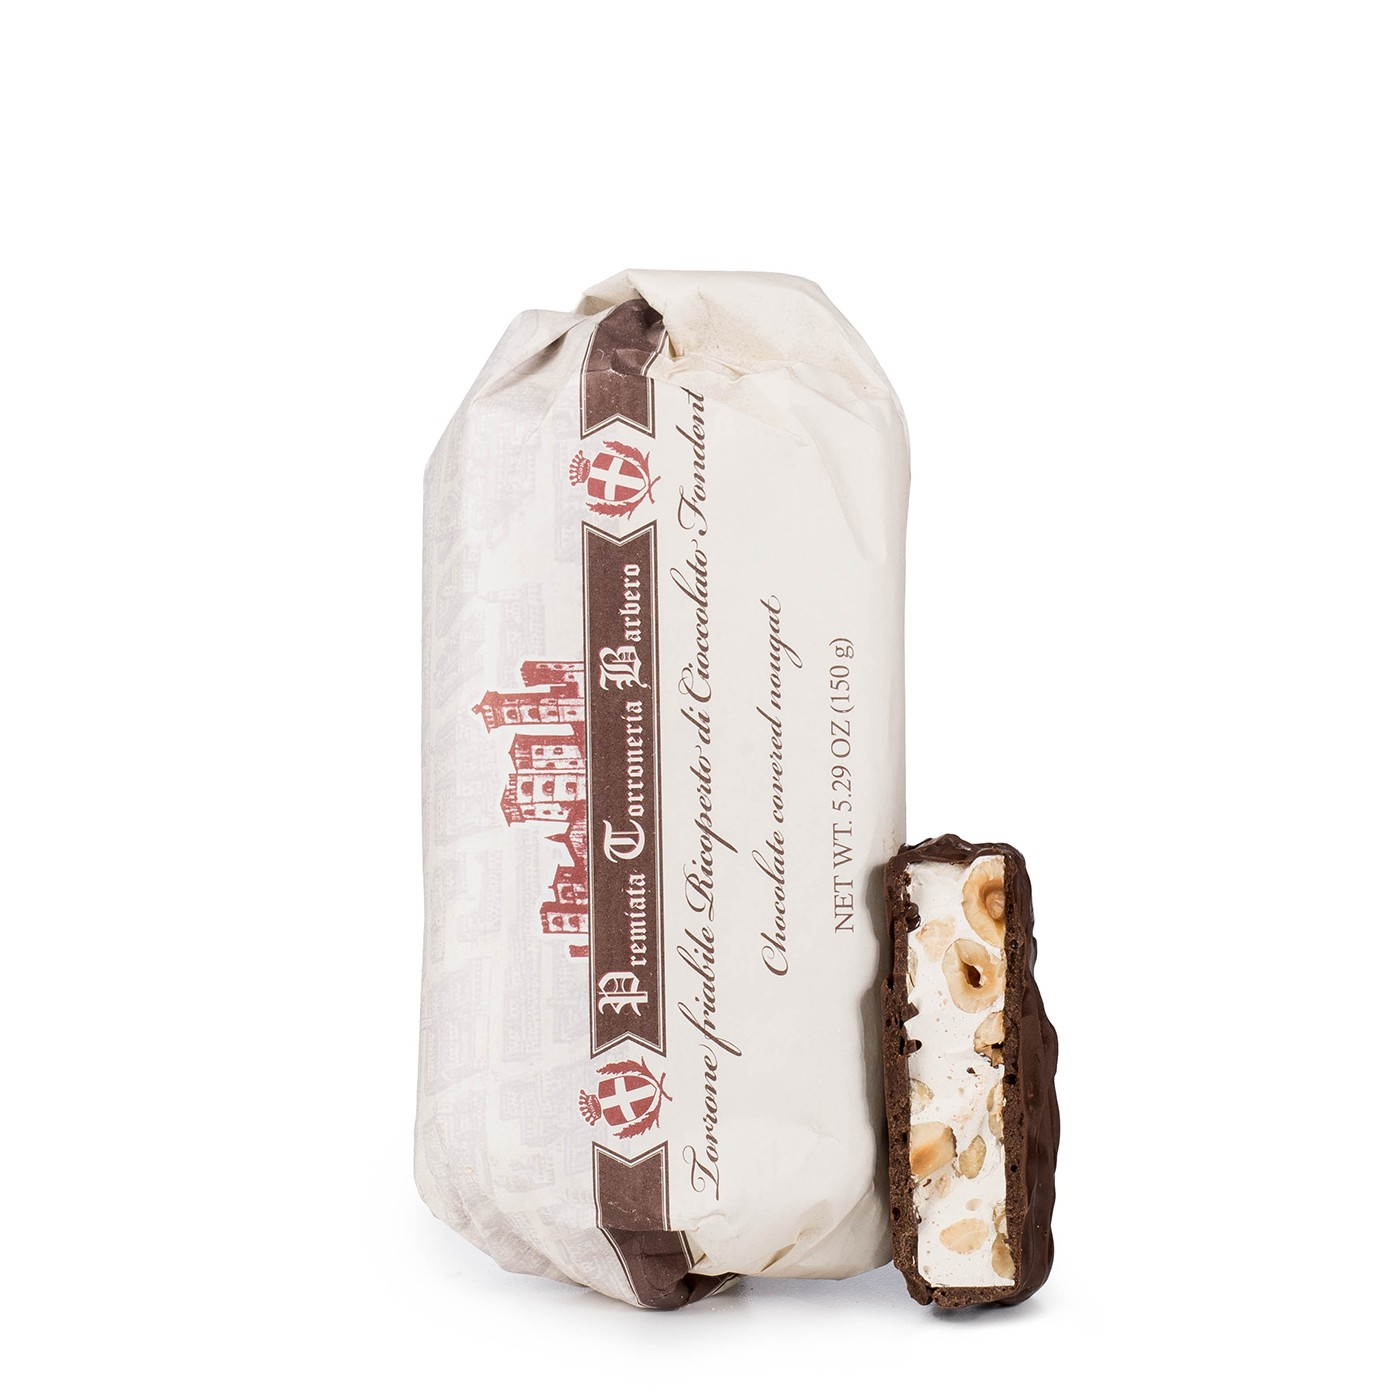 Chocolate Torrone 5.3 oz